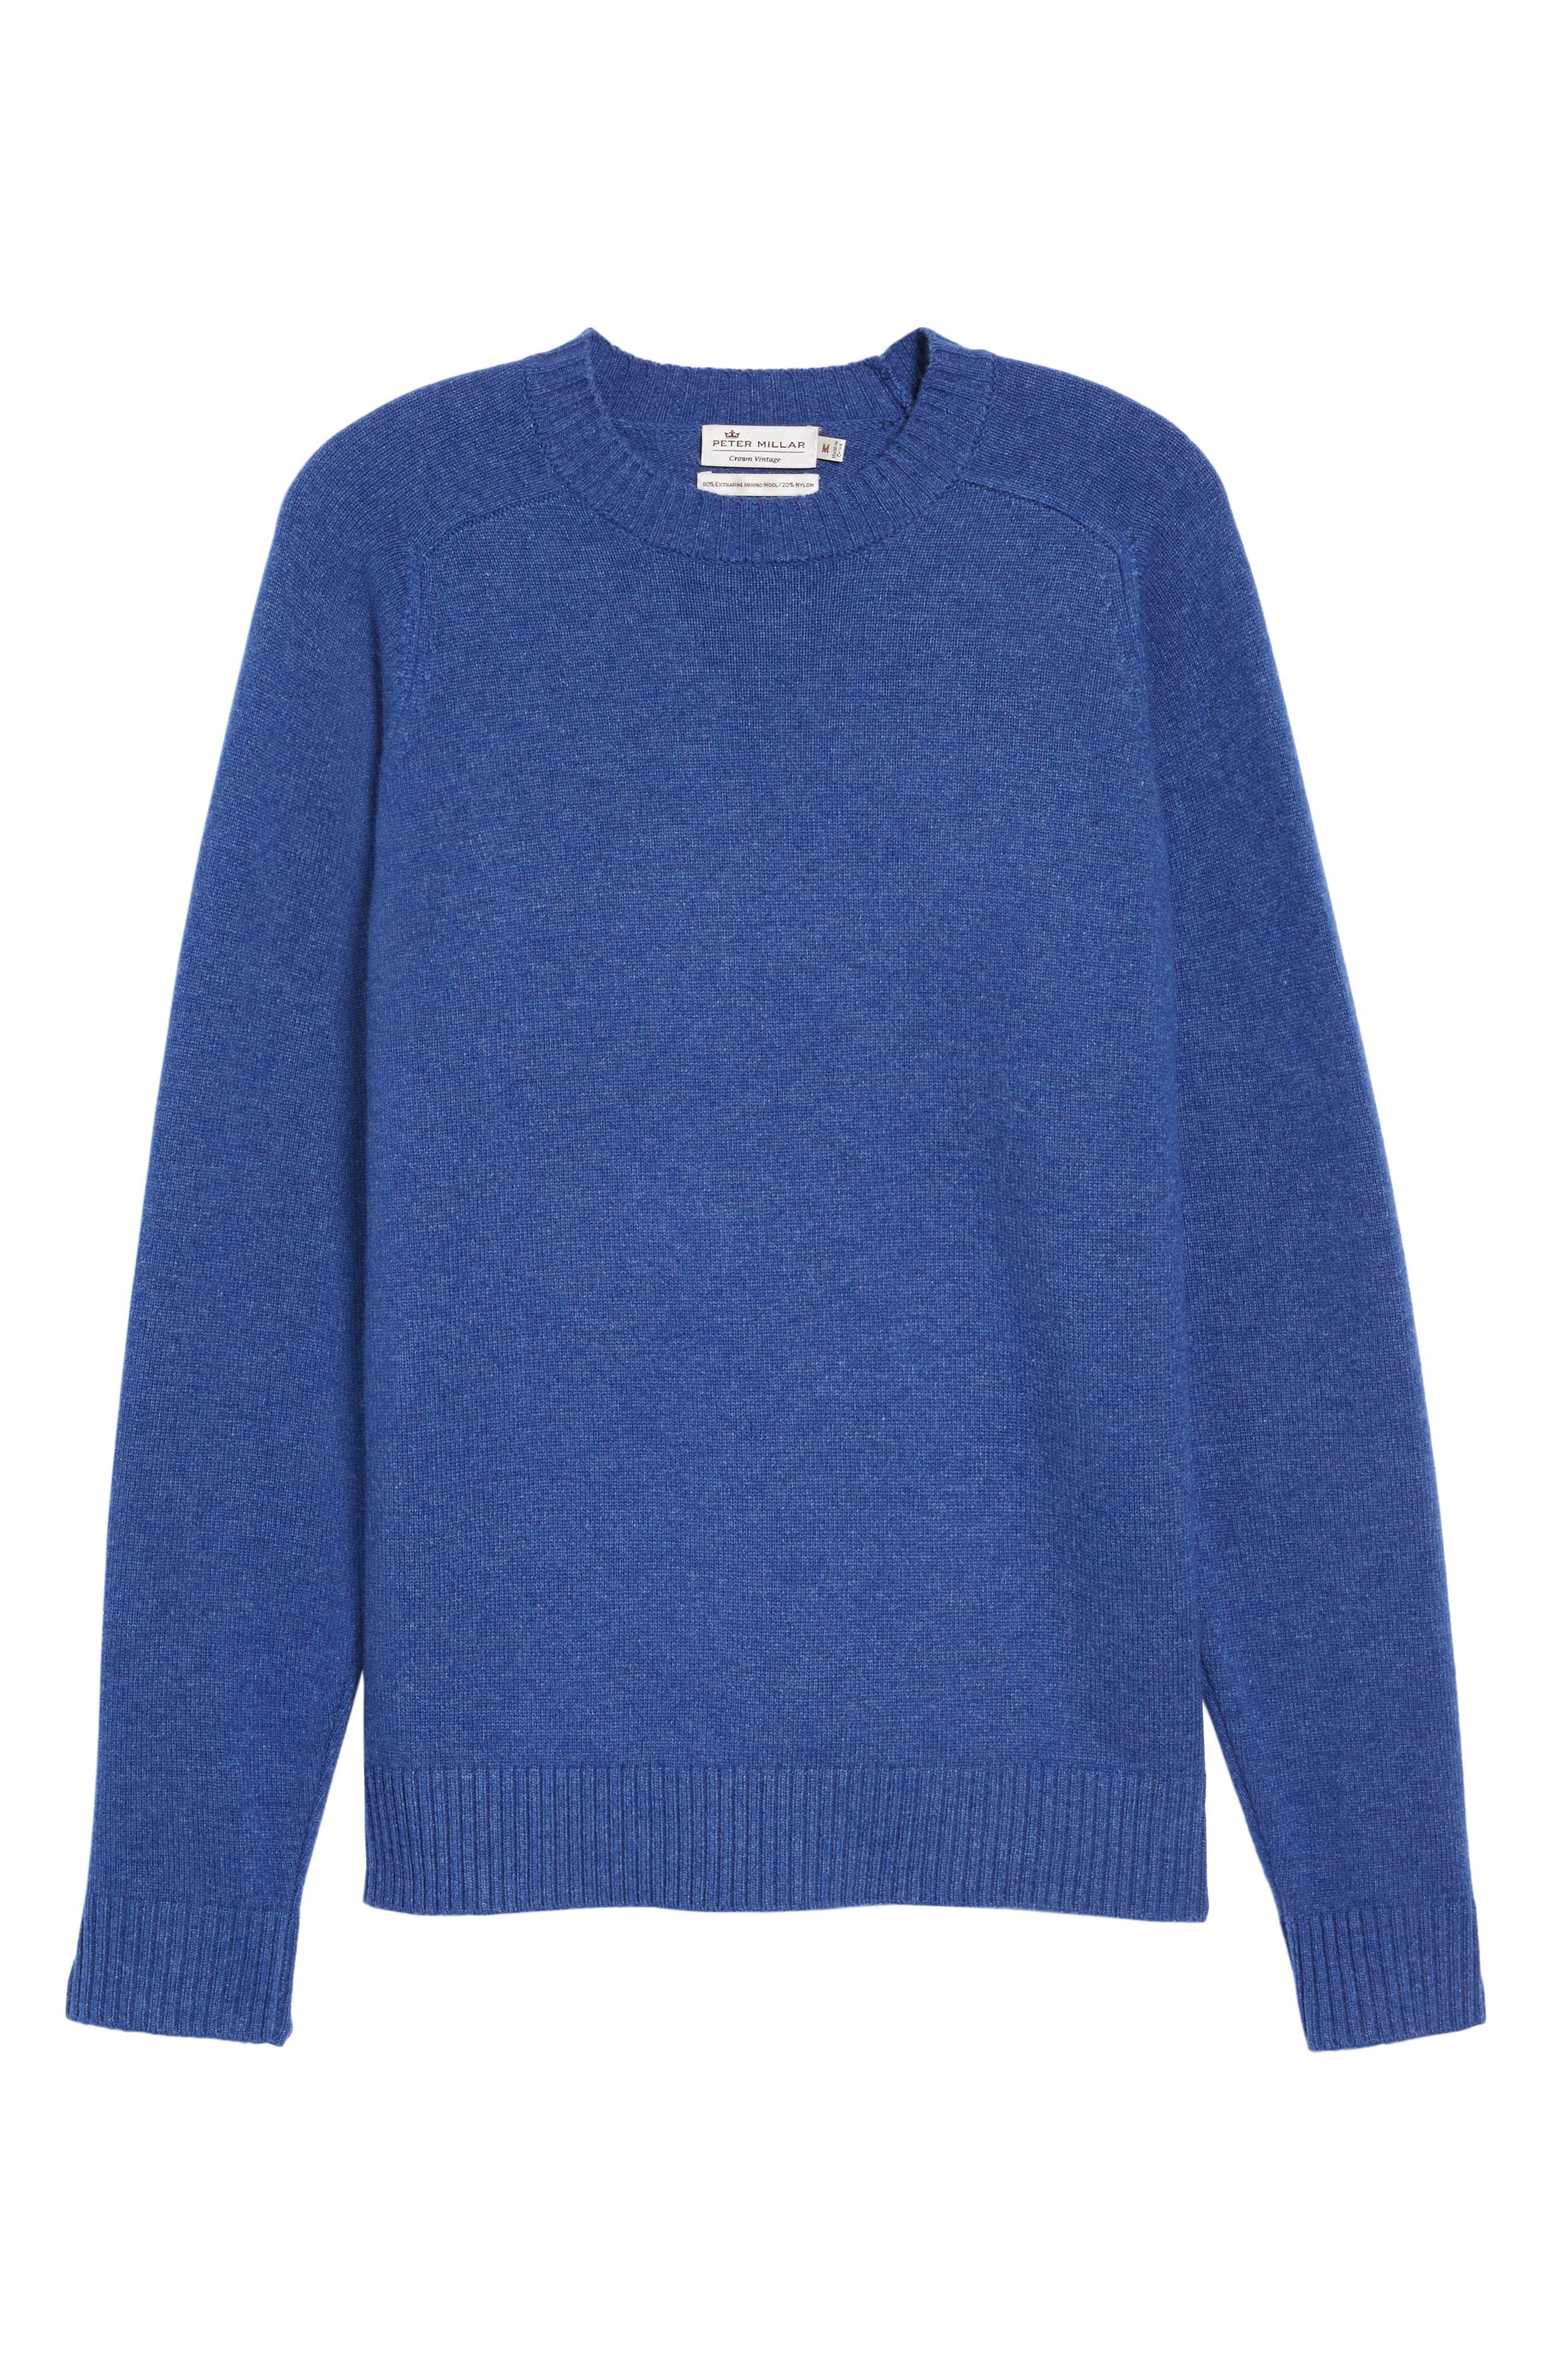 Crown Vintage Crewneck Sweatshirt,                             Alternate thumbnail 12, color,